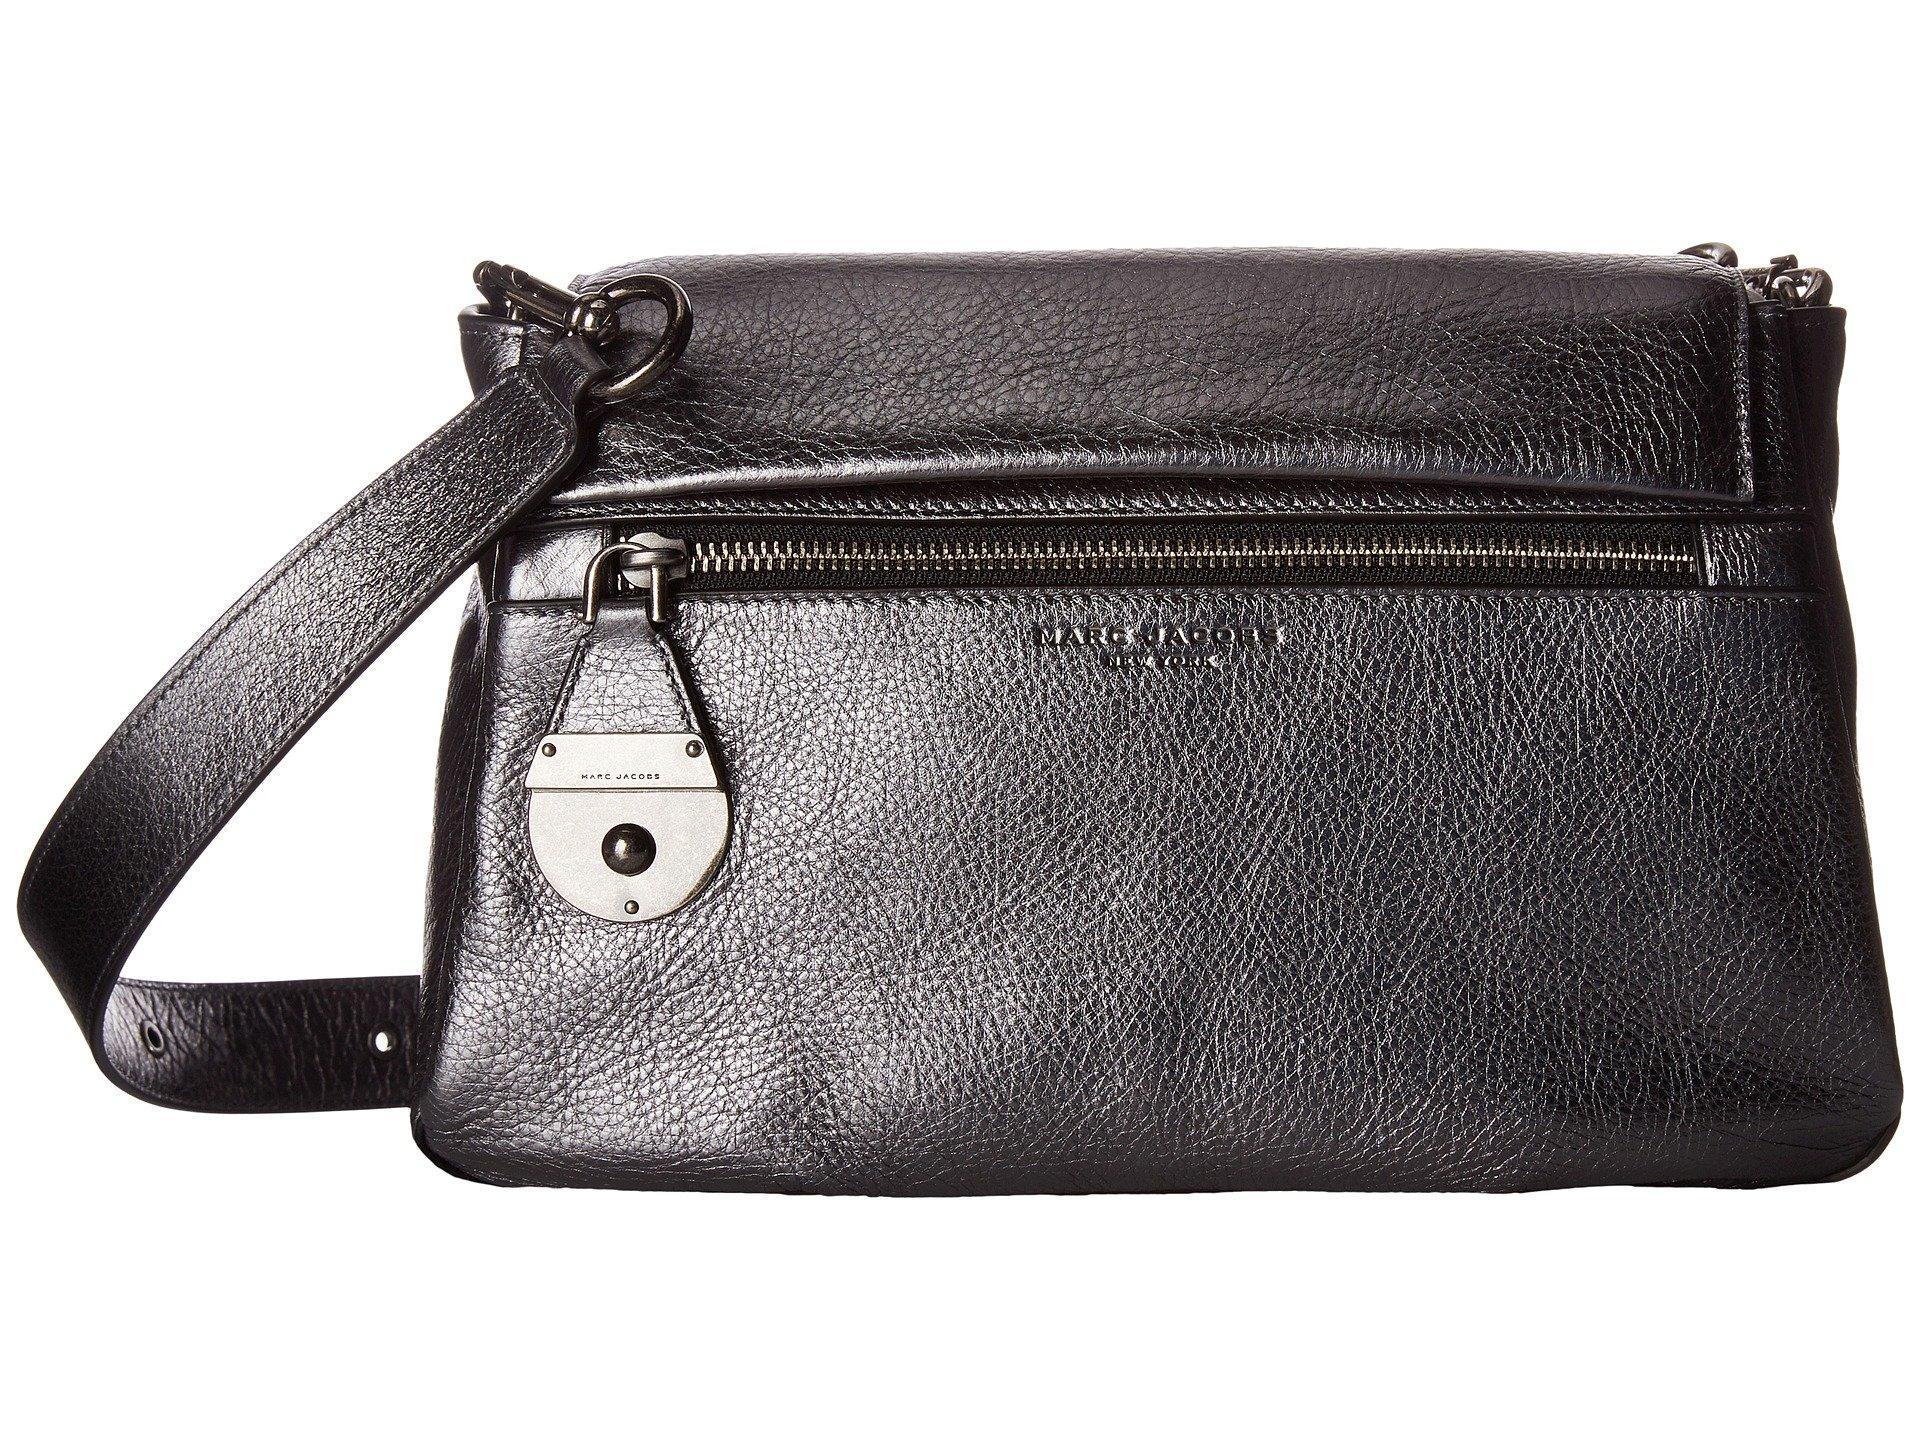 Marc Jacobs The Standard Metallic Shoulder Bag, Anthracite